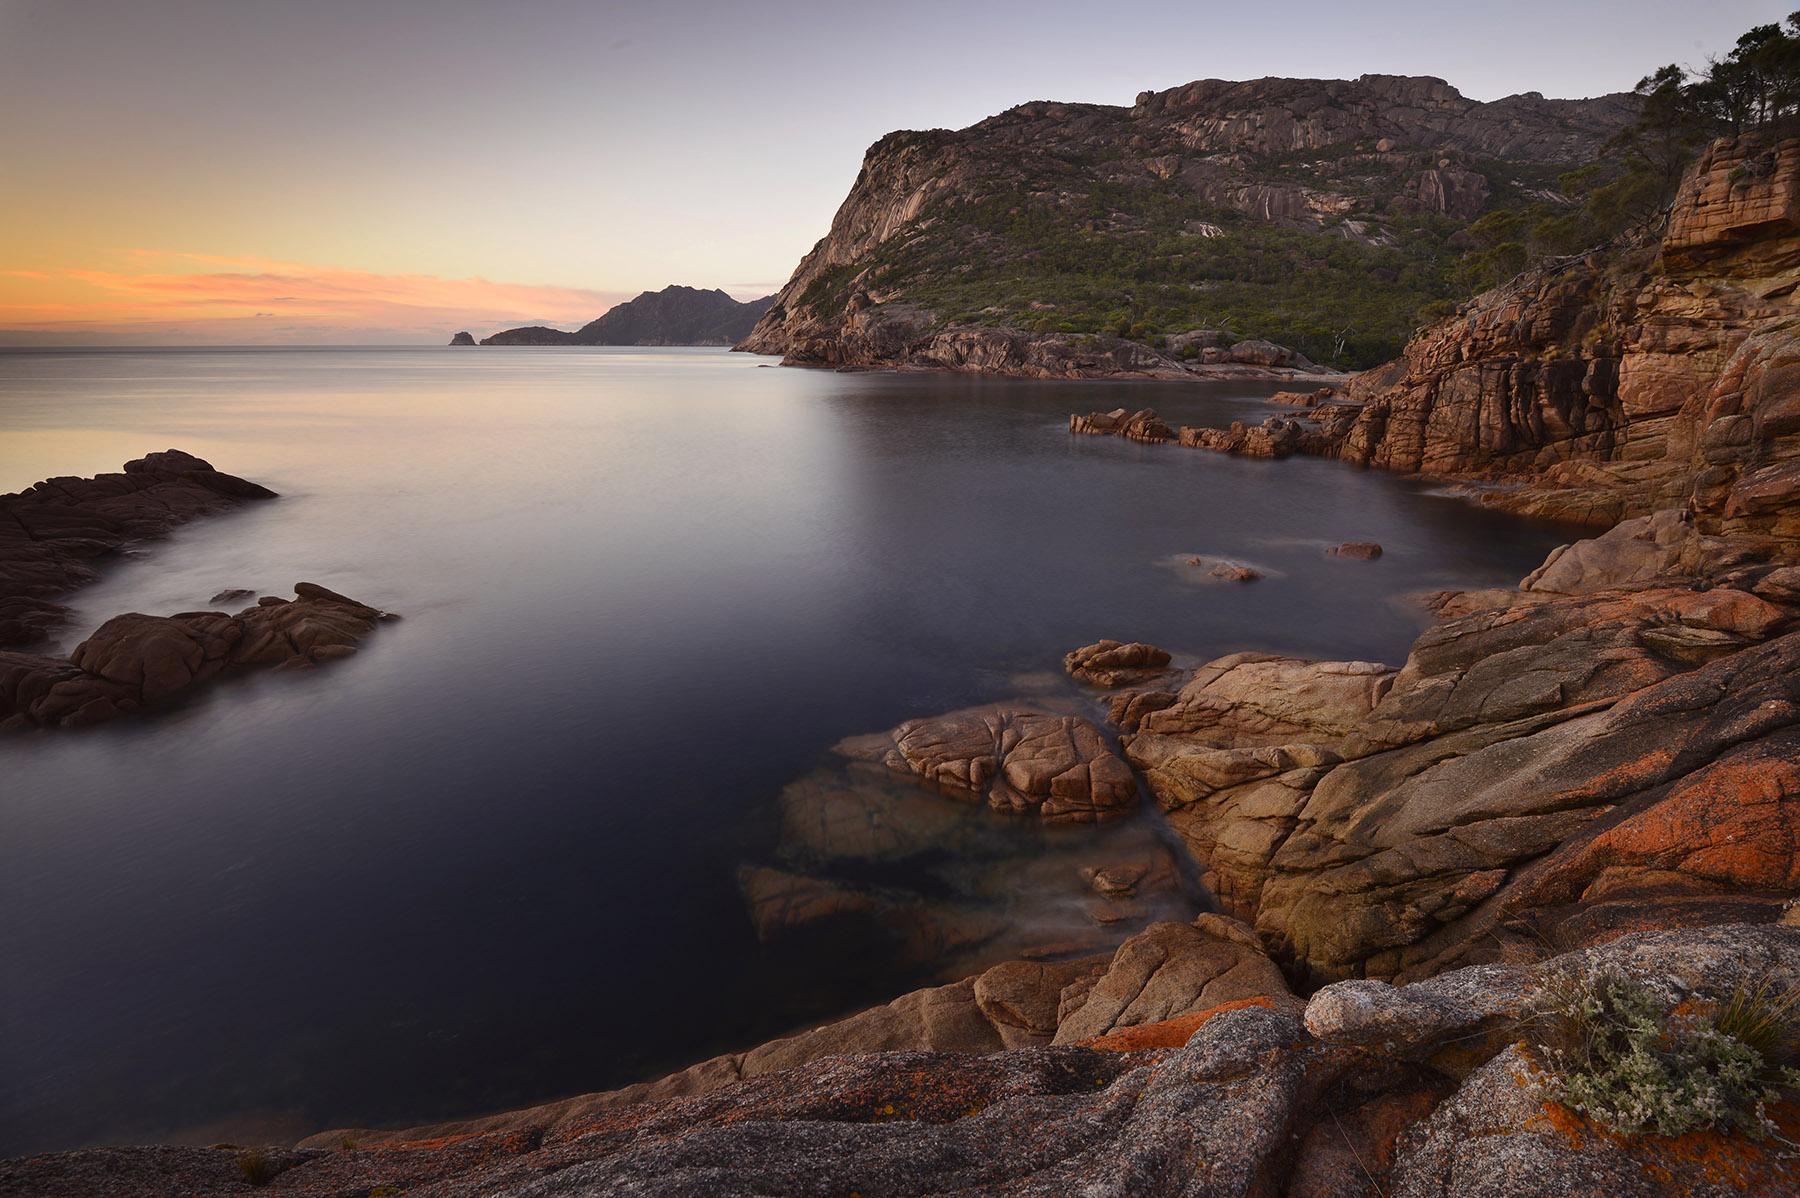 Sleepy bay, Tasmania